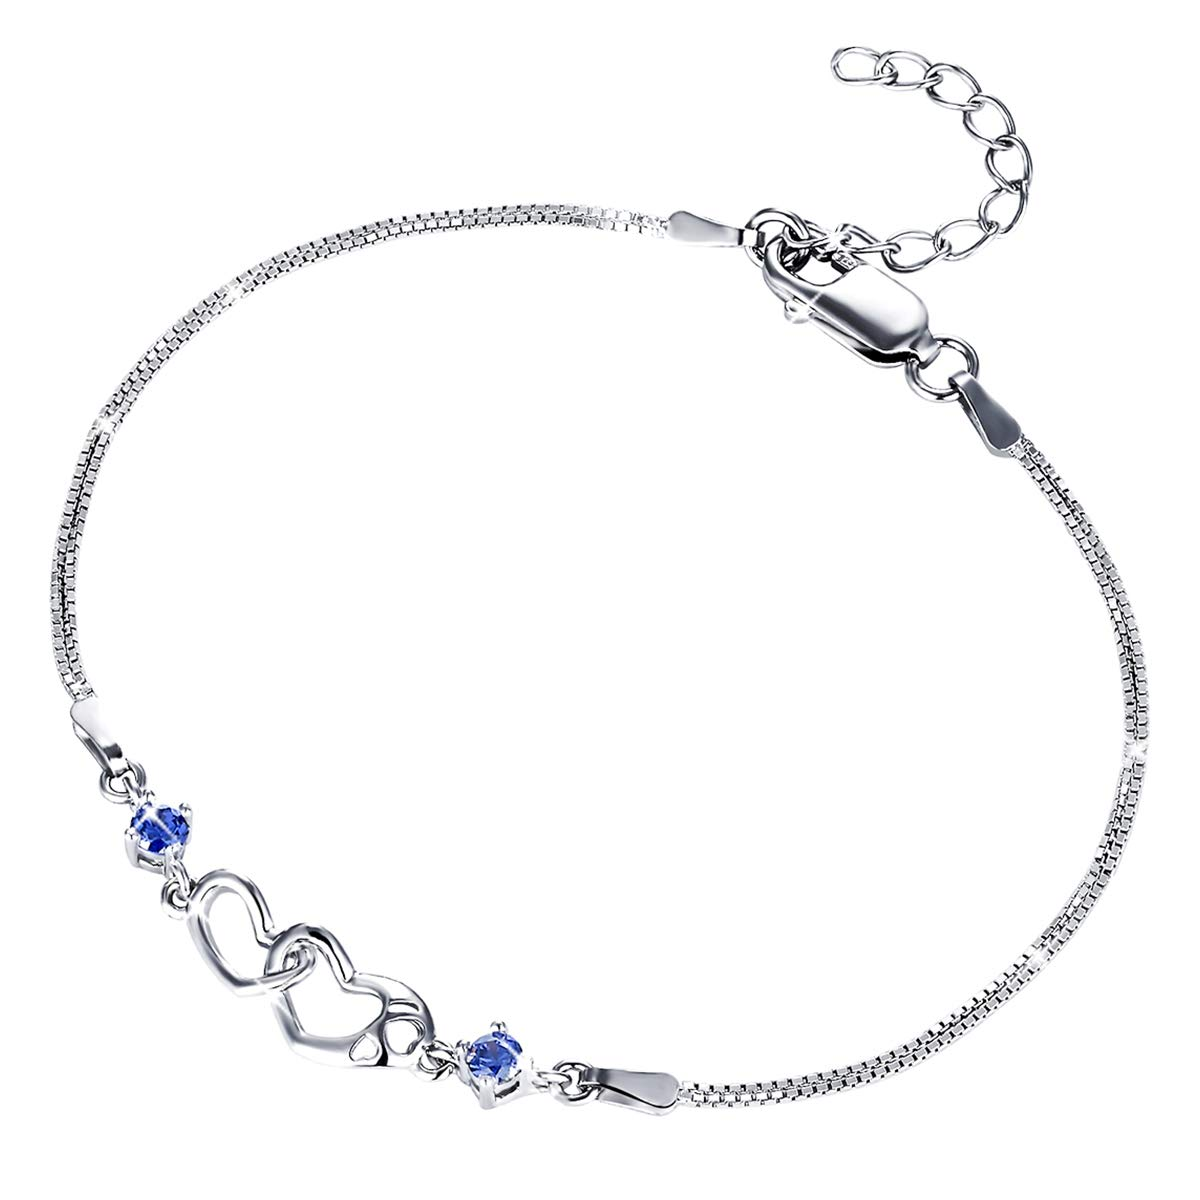 MUATOGIML 925 Sterling Silver Blue Infinity Endless Love Double Heart Bracelet Jewelry for Women Girls, 18'' Box Chain